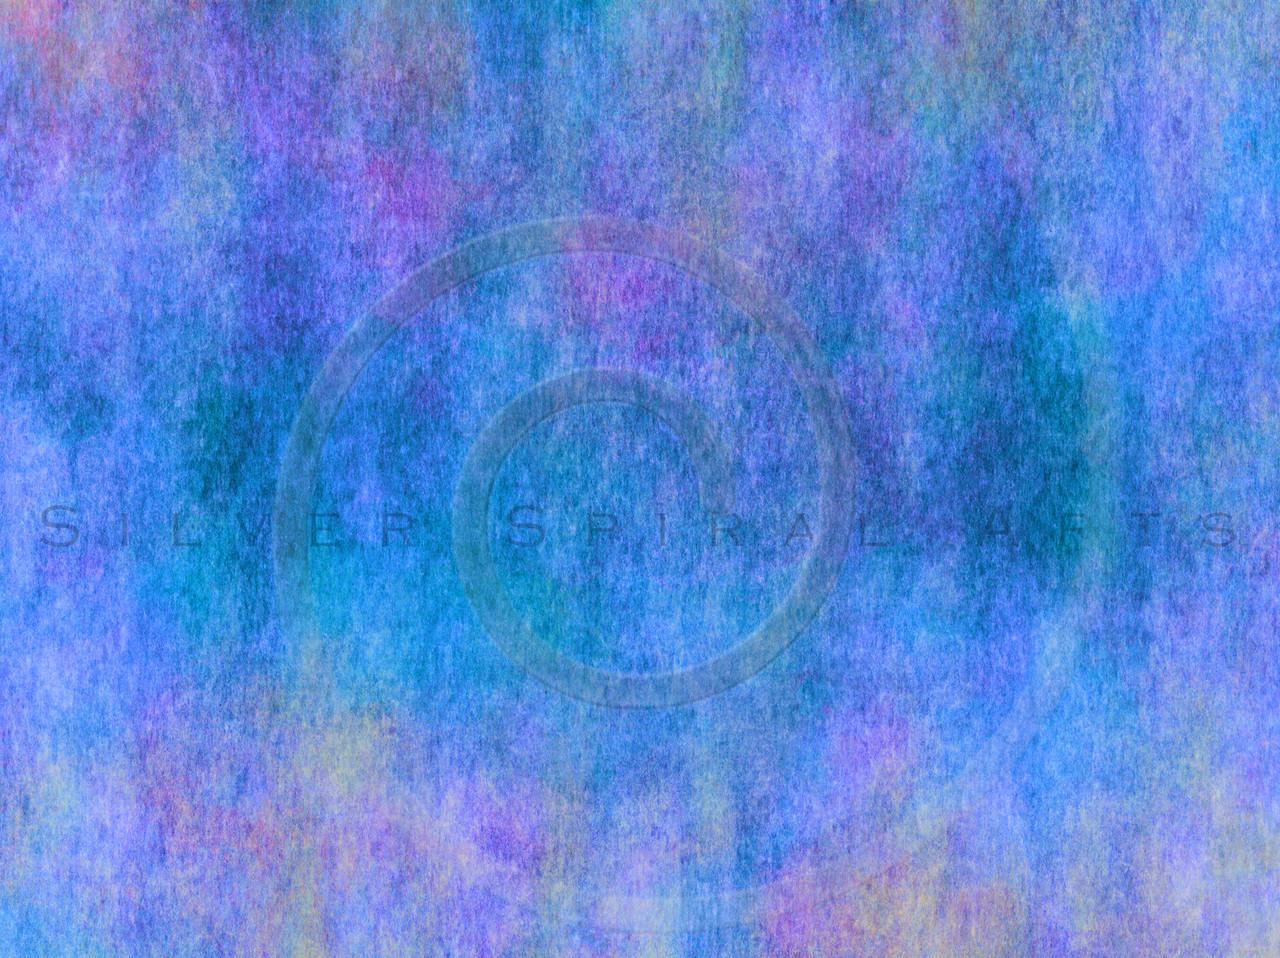 Teal Aqua Blue Purple Watercolor Paper Texture Background